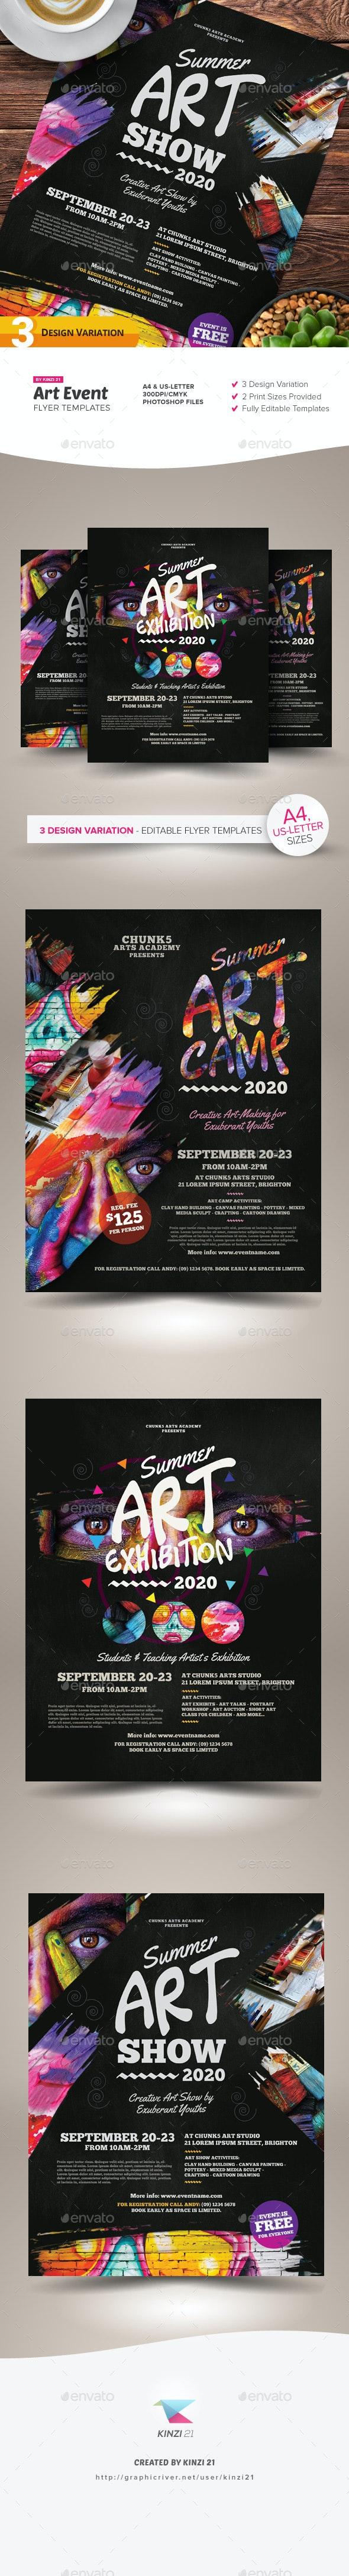 Art Event Flyer Templates - Miscellaneous Events